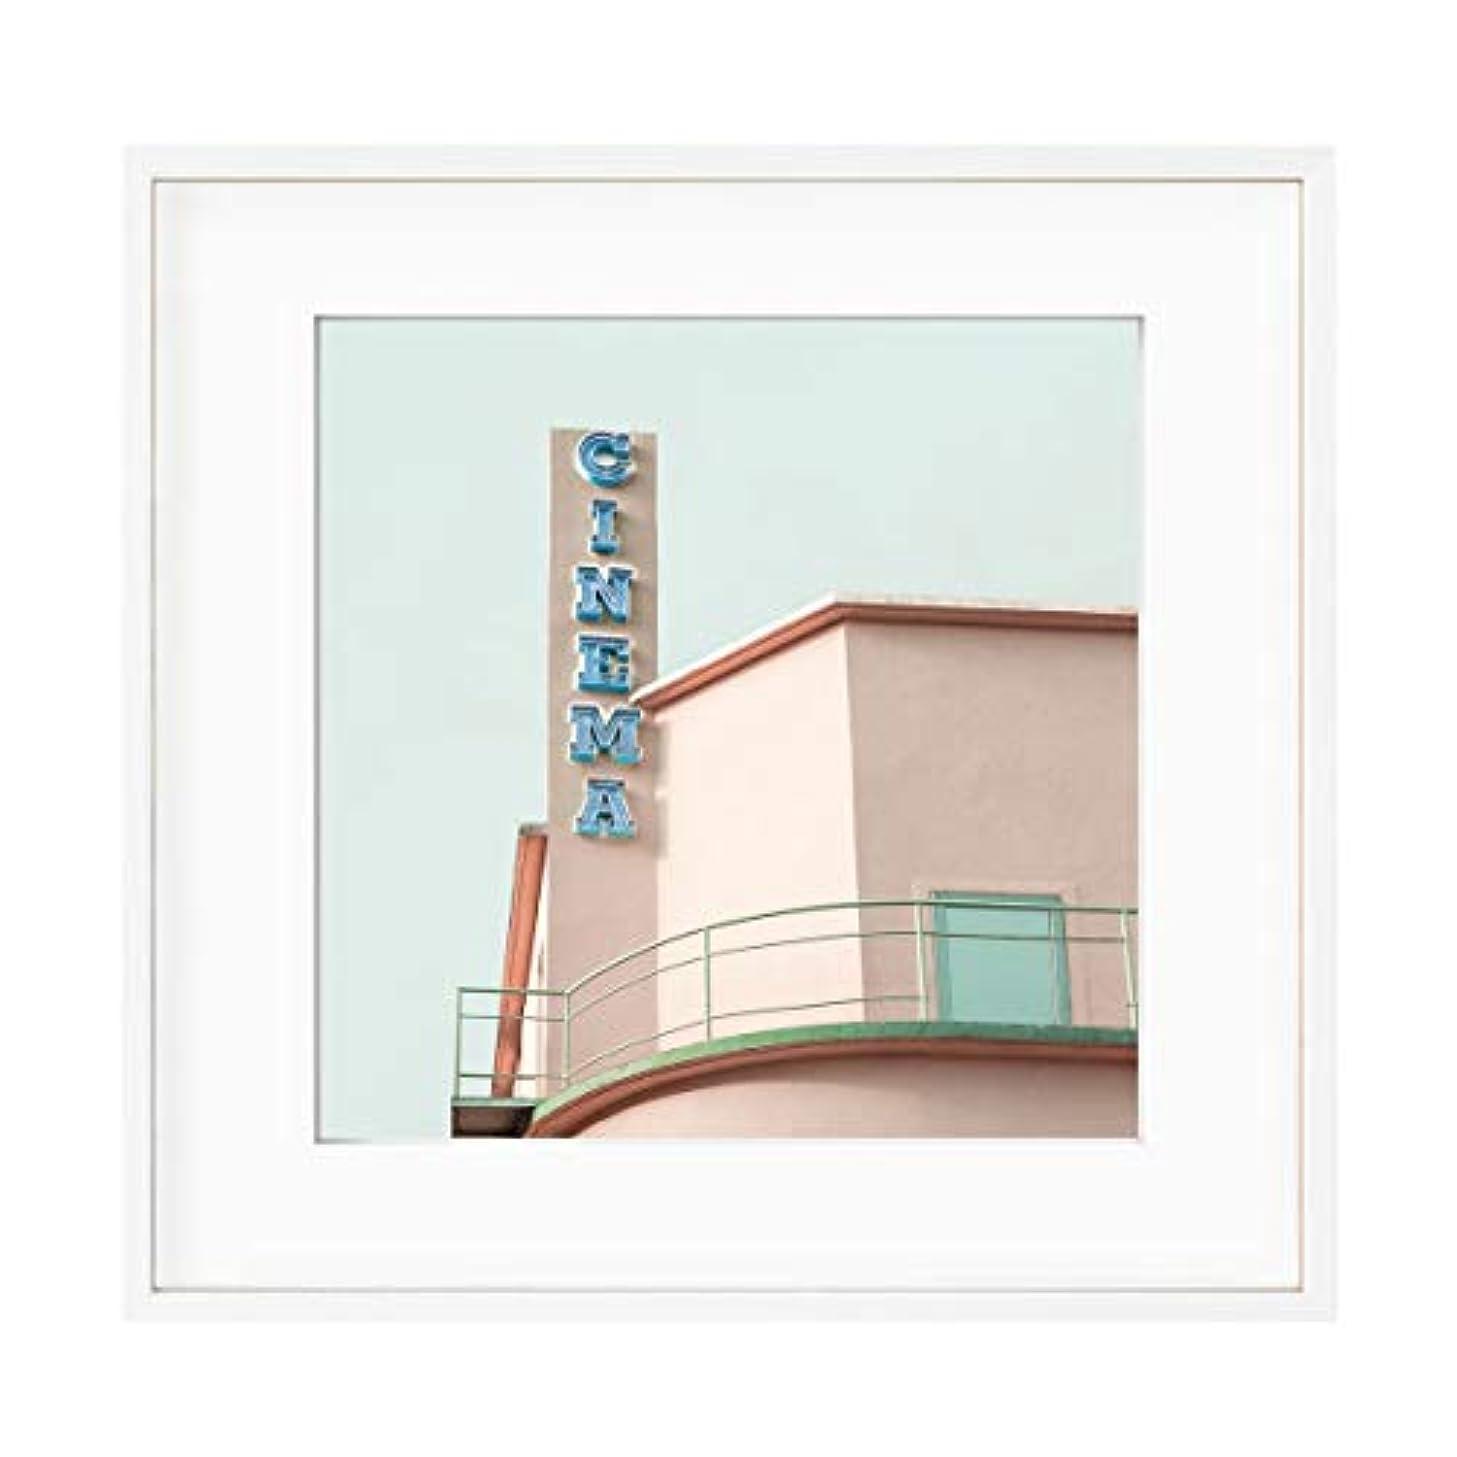 Vintage Cinema Frame Solid Oak Natural with Mount, Multicolored, 50x50